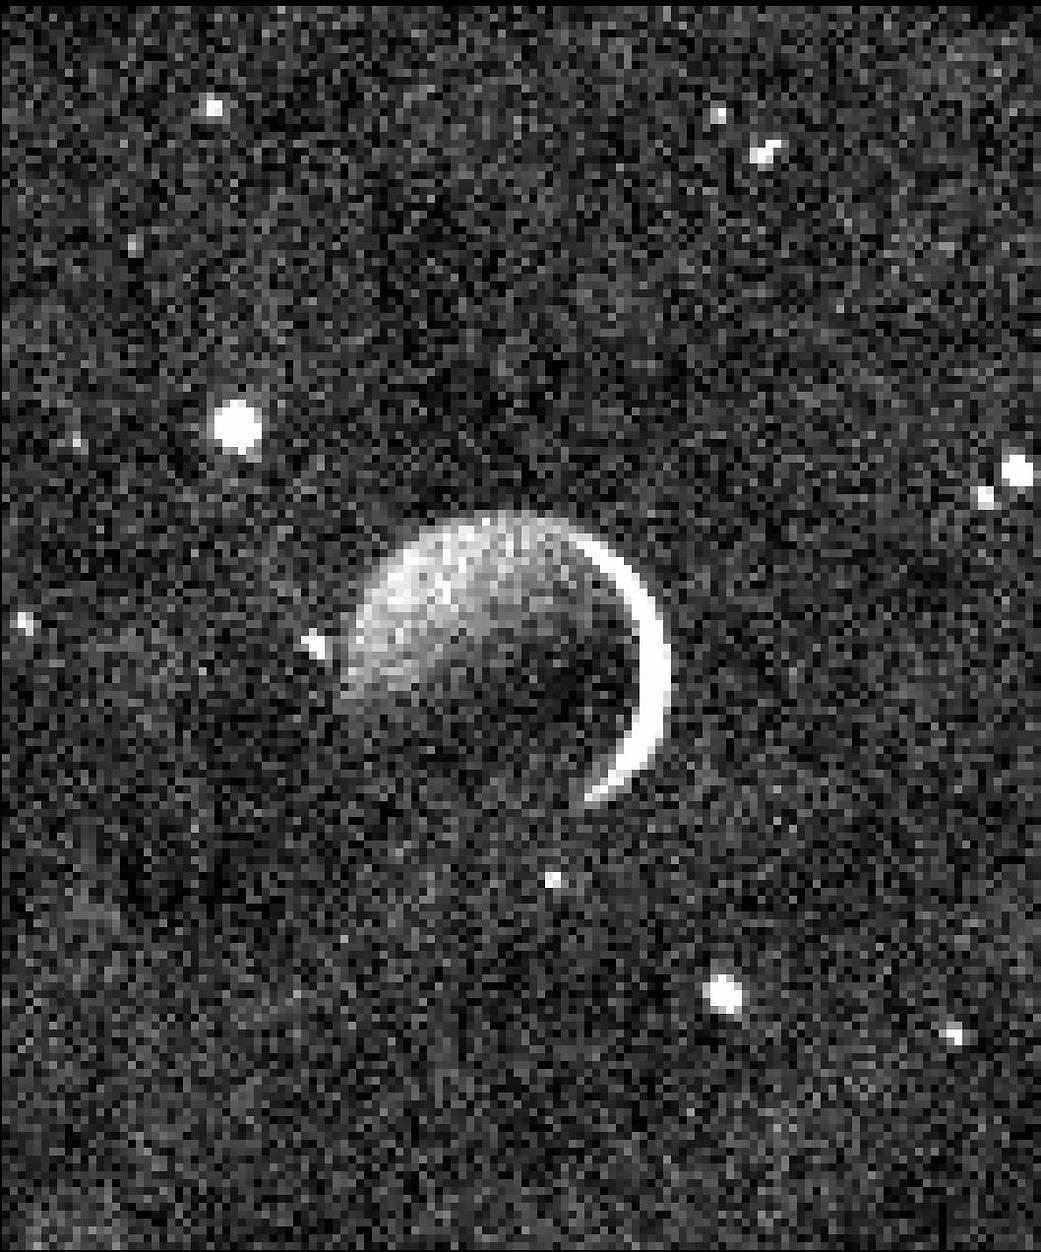 Kerberos Moon Of Plluto: NASA's New Horizons: Amazing New Image Of Pluto's Biggest